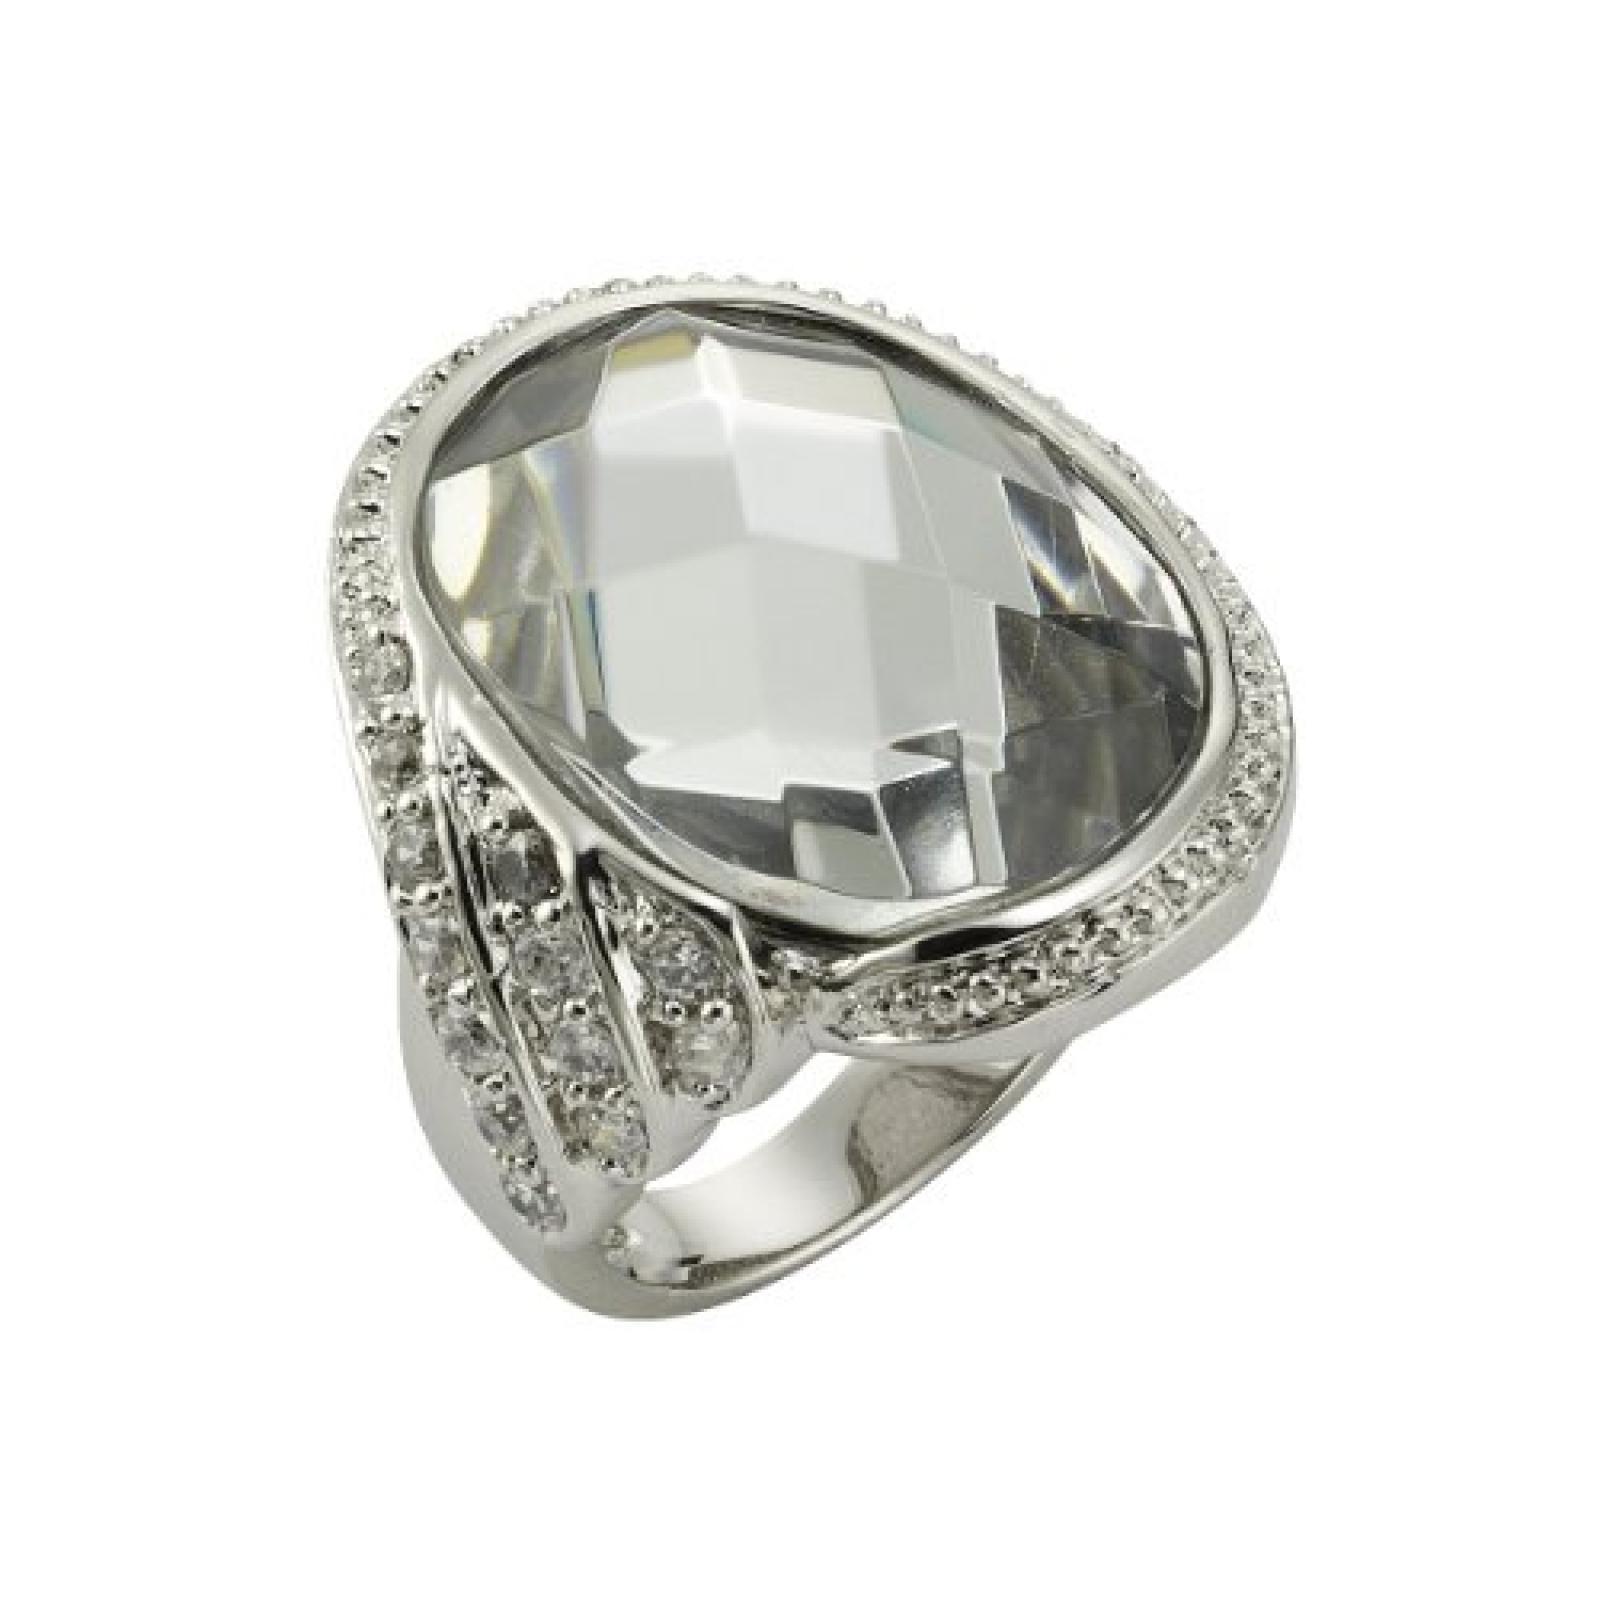 Celesta Damen-Ring Fashion Messing Kristall + Zirkonia weiß 57 (18.1) 360070400-018